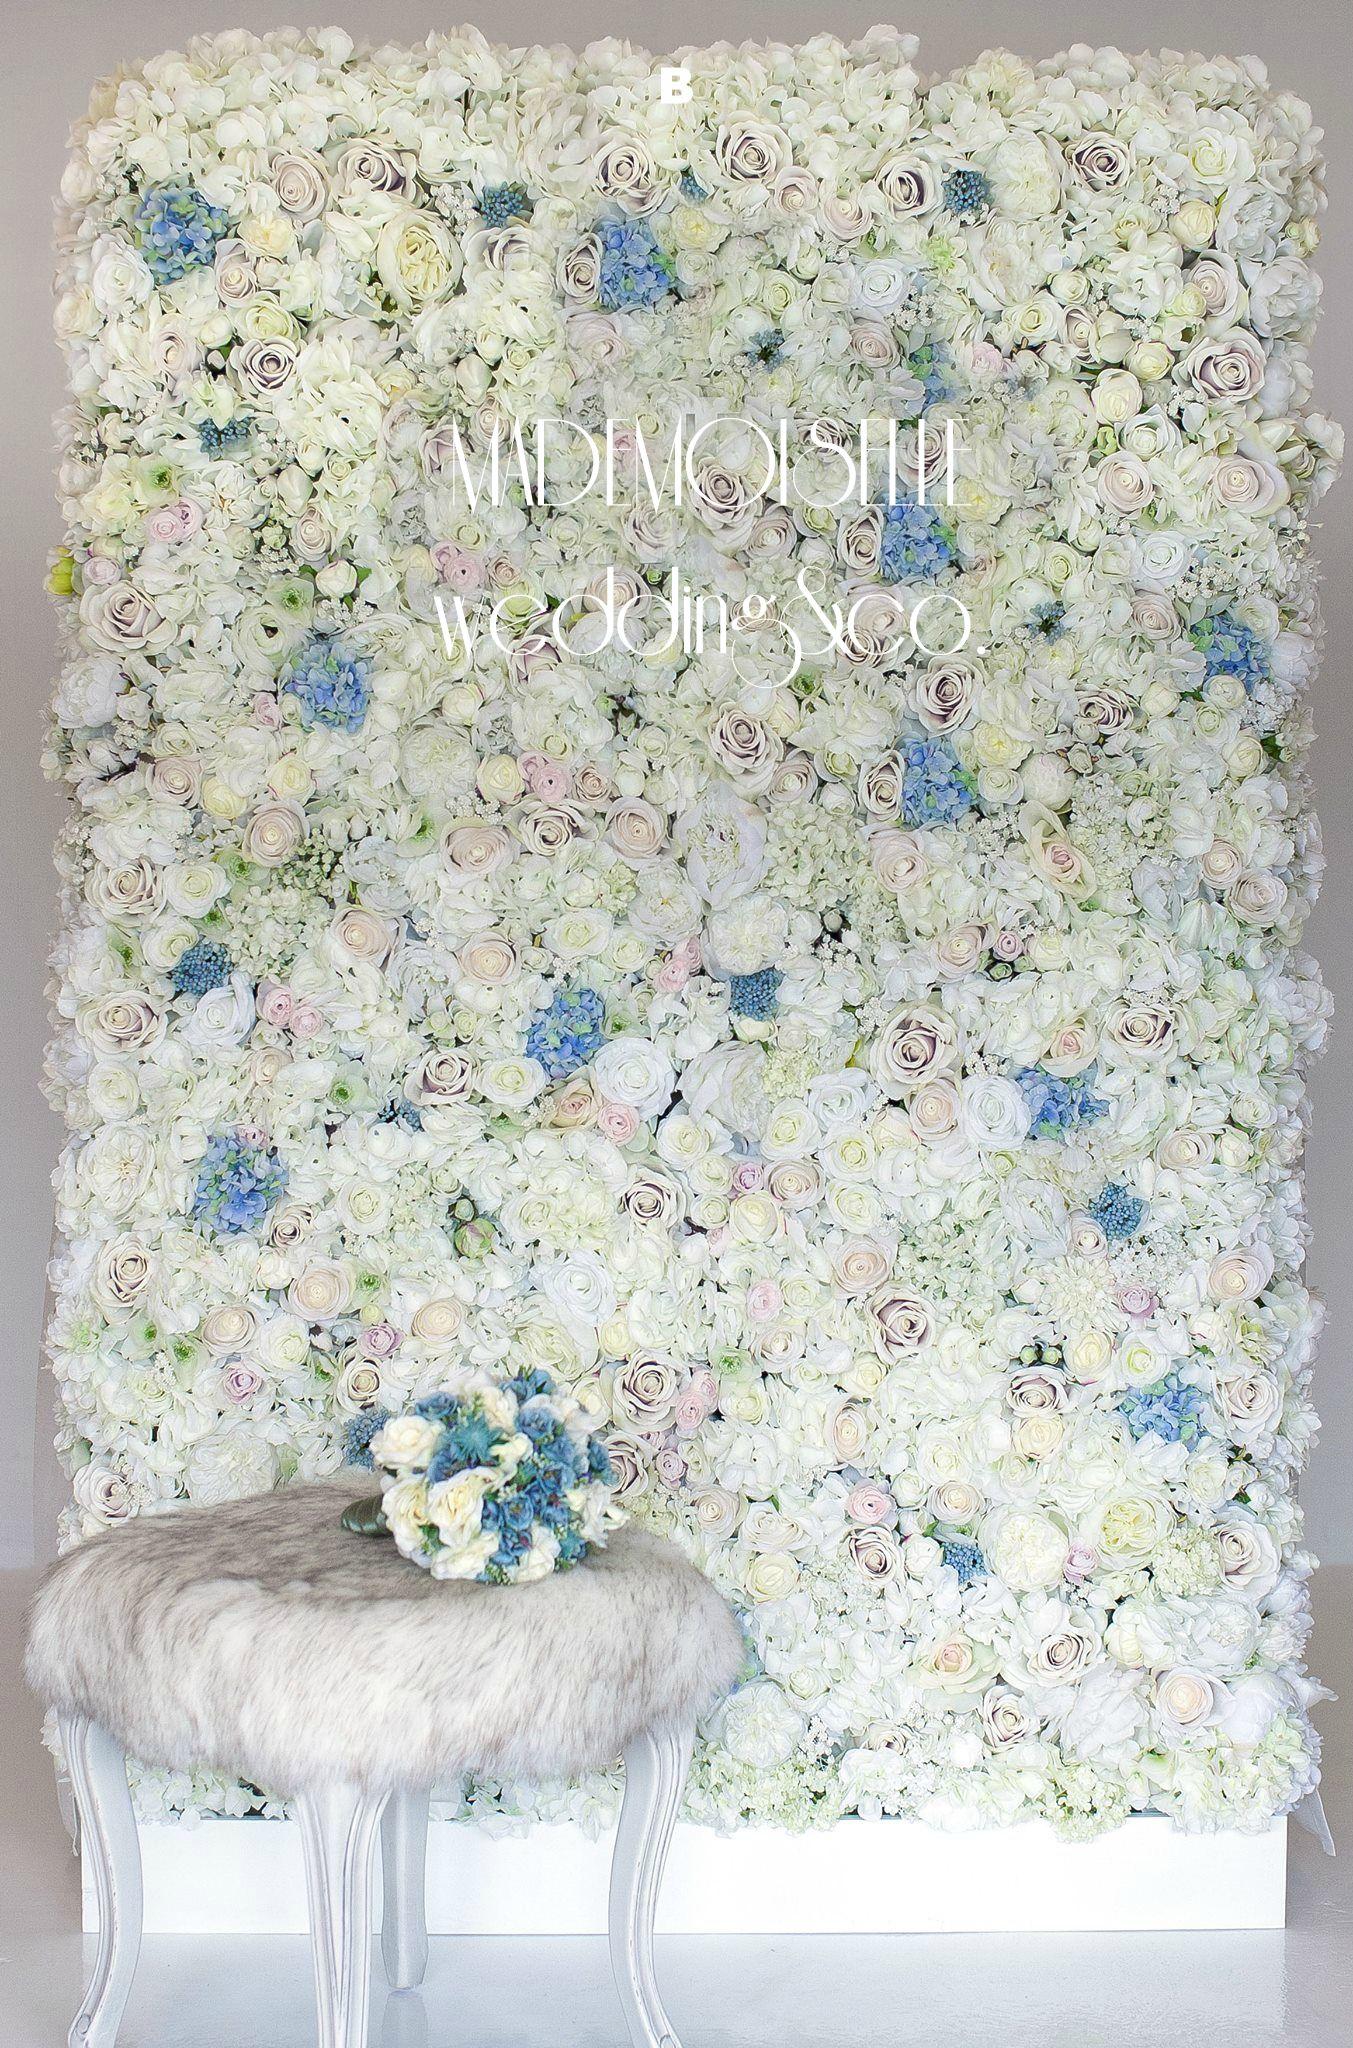 cvetni zid - 006